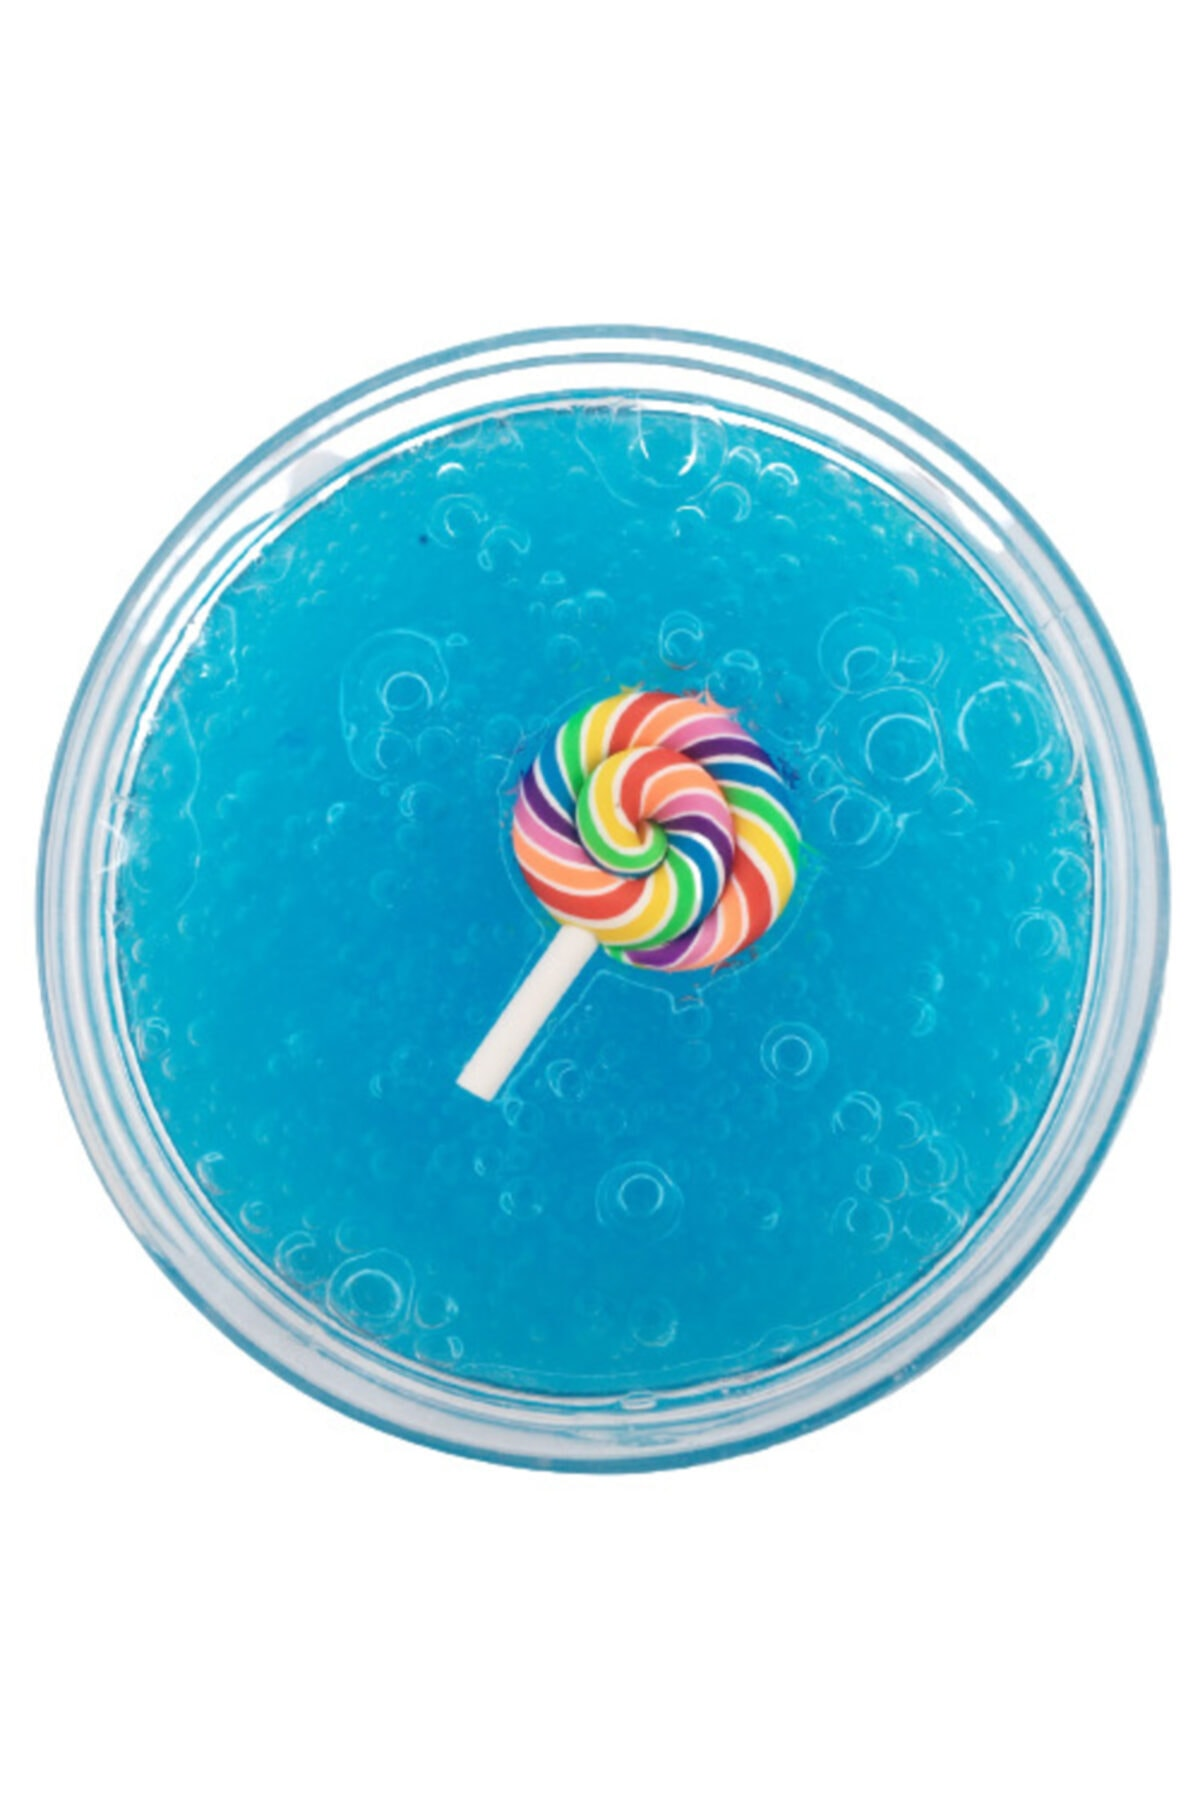 Slimewapi Mavi Jelly Belly Ocean Rainbow Slime Seti - 250 ml 1